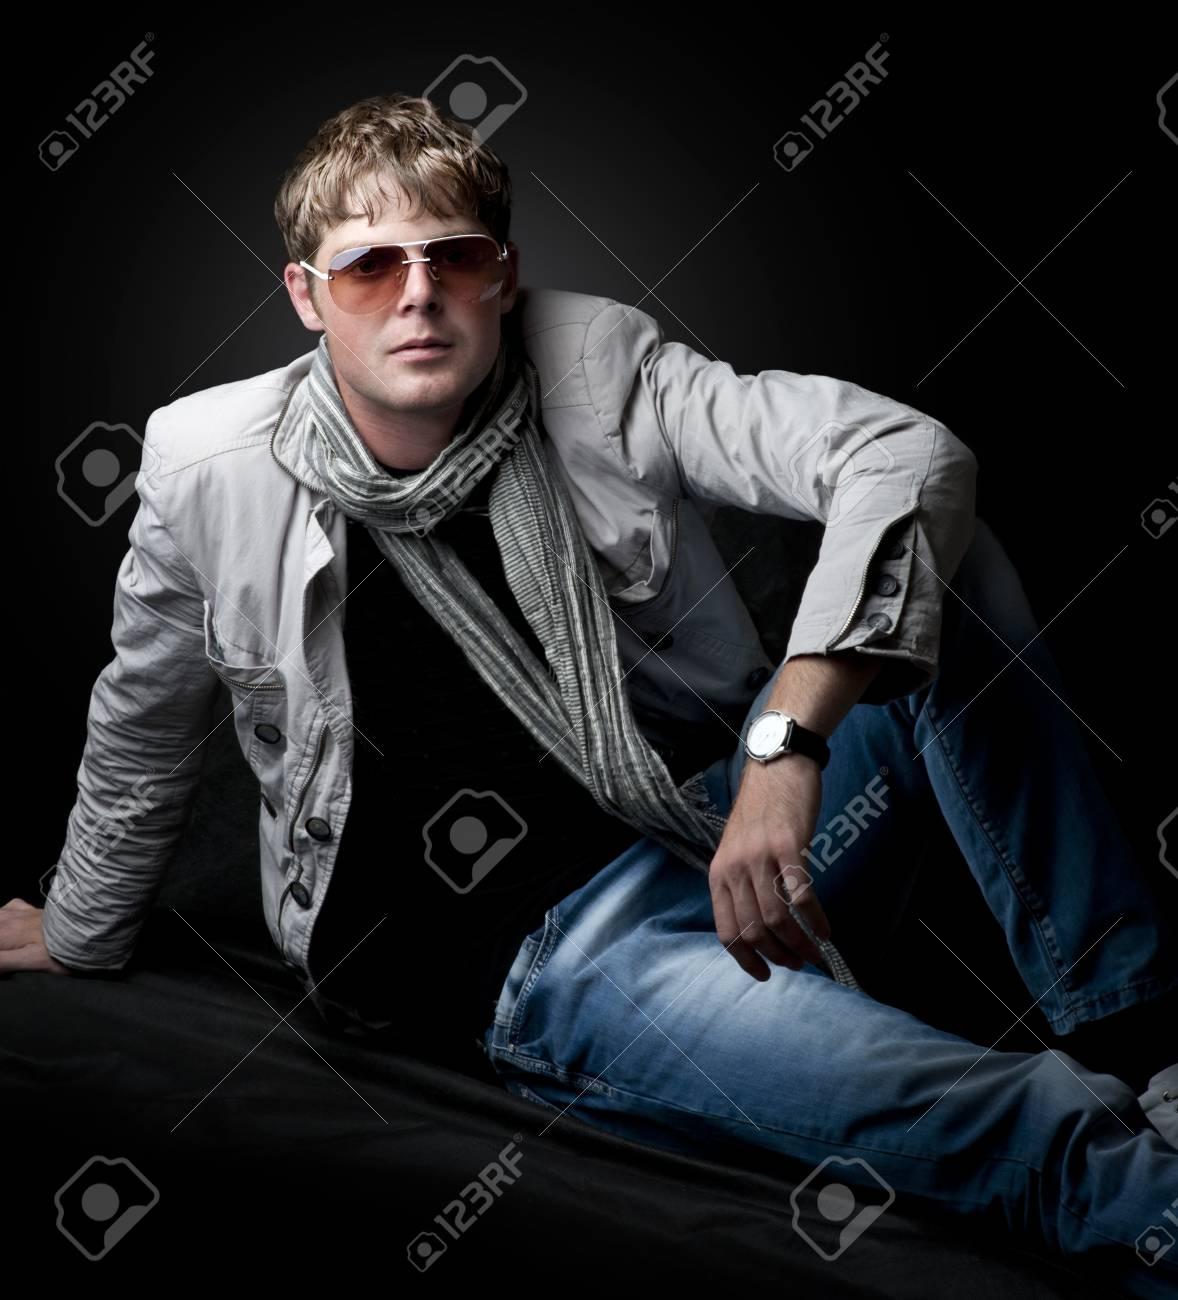 Young fashion man sitting on black background Stock Photo - 13889015